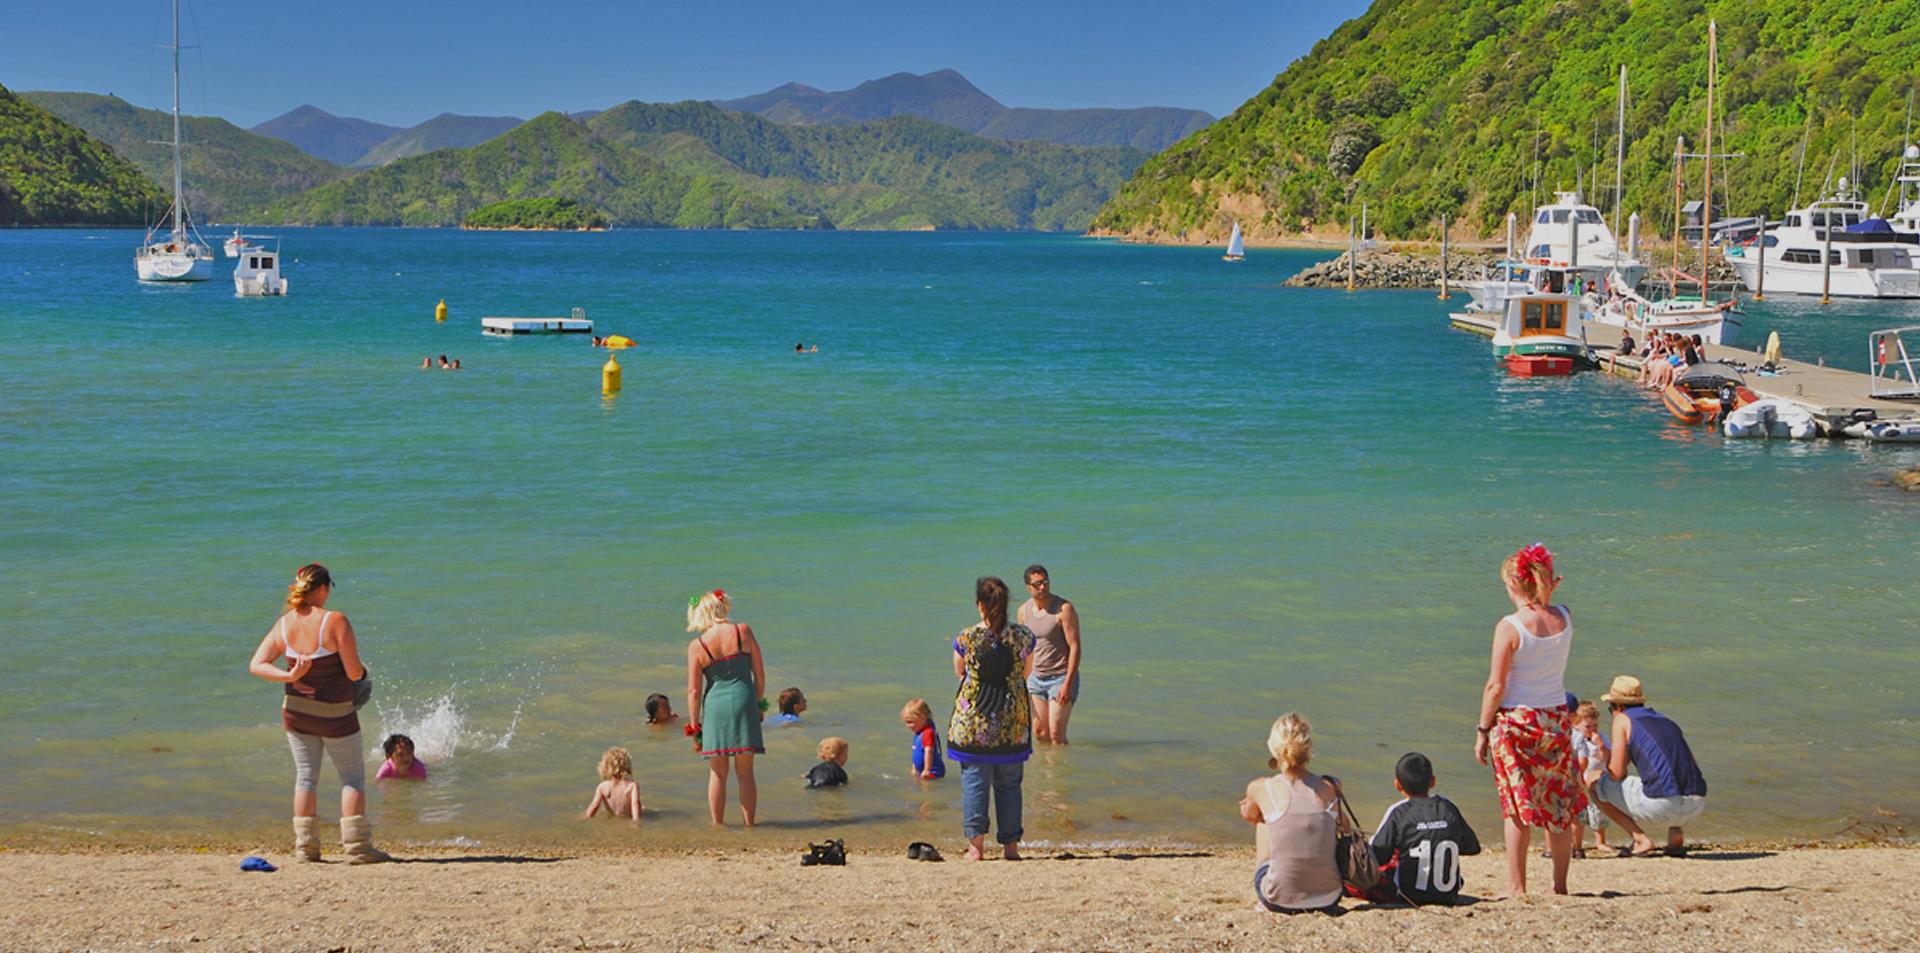 napier-familycentre-family-enjoying-beach